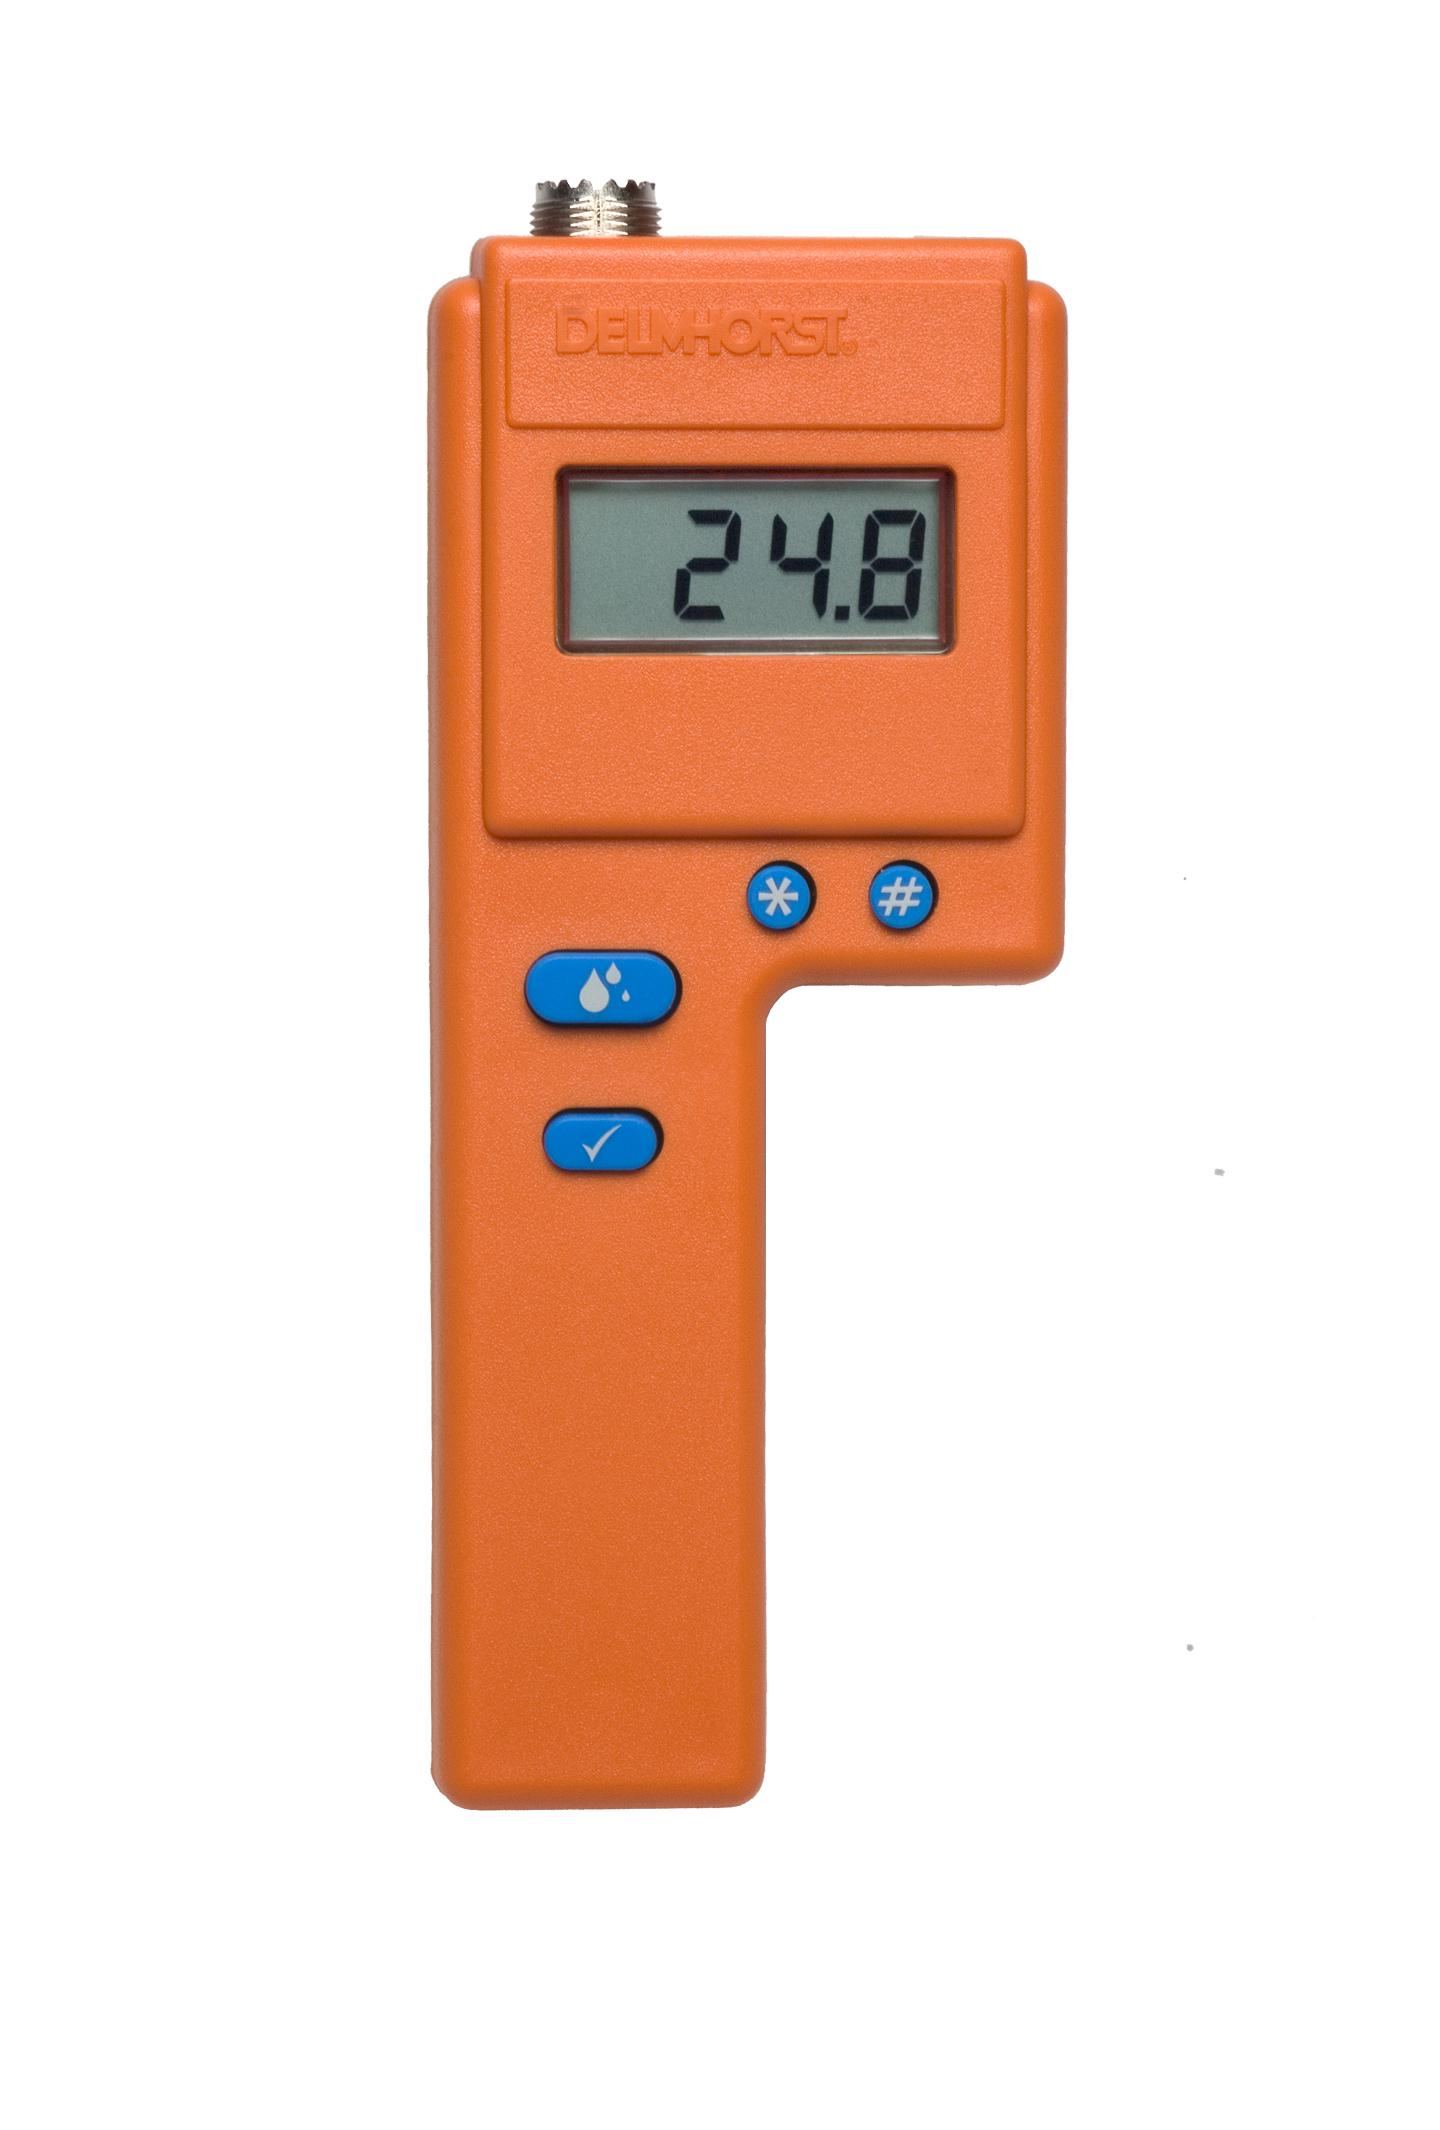 F-2000 moisture meter